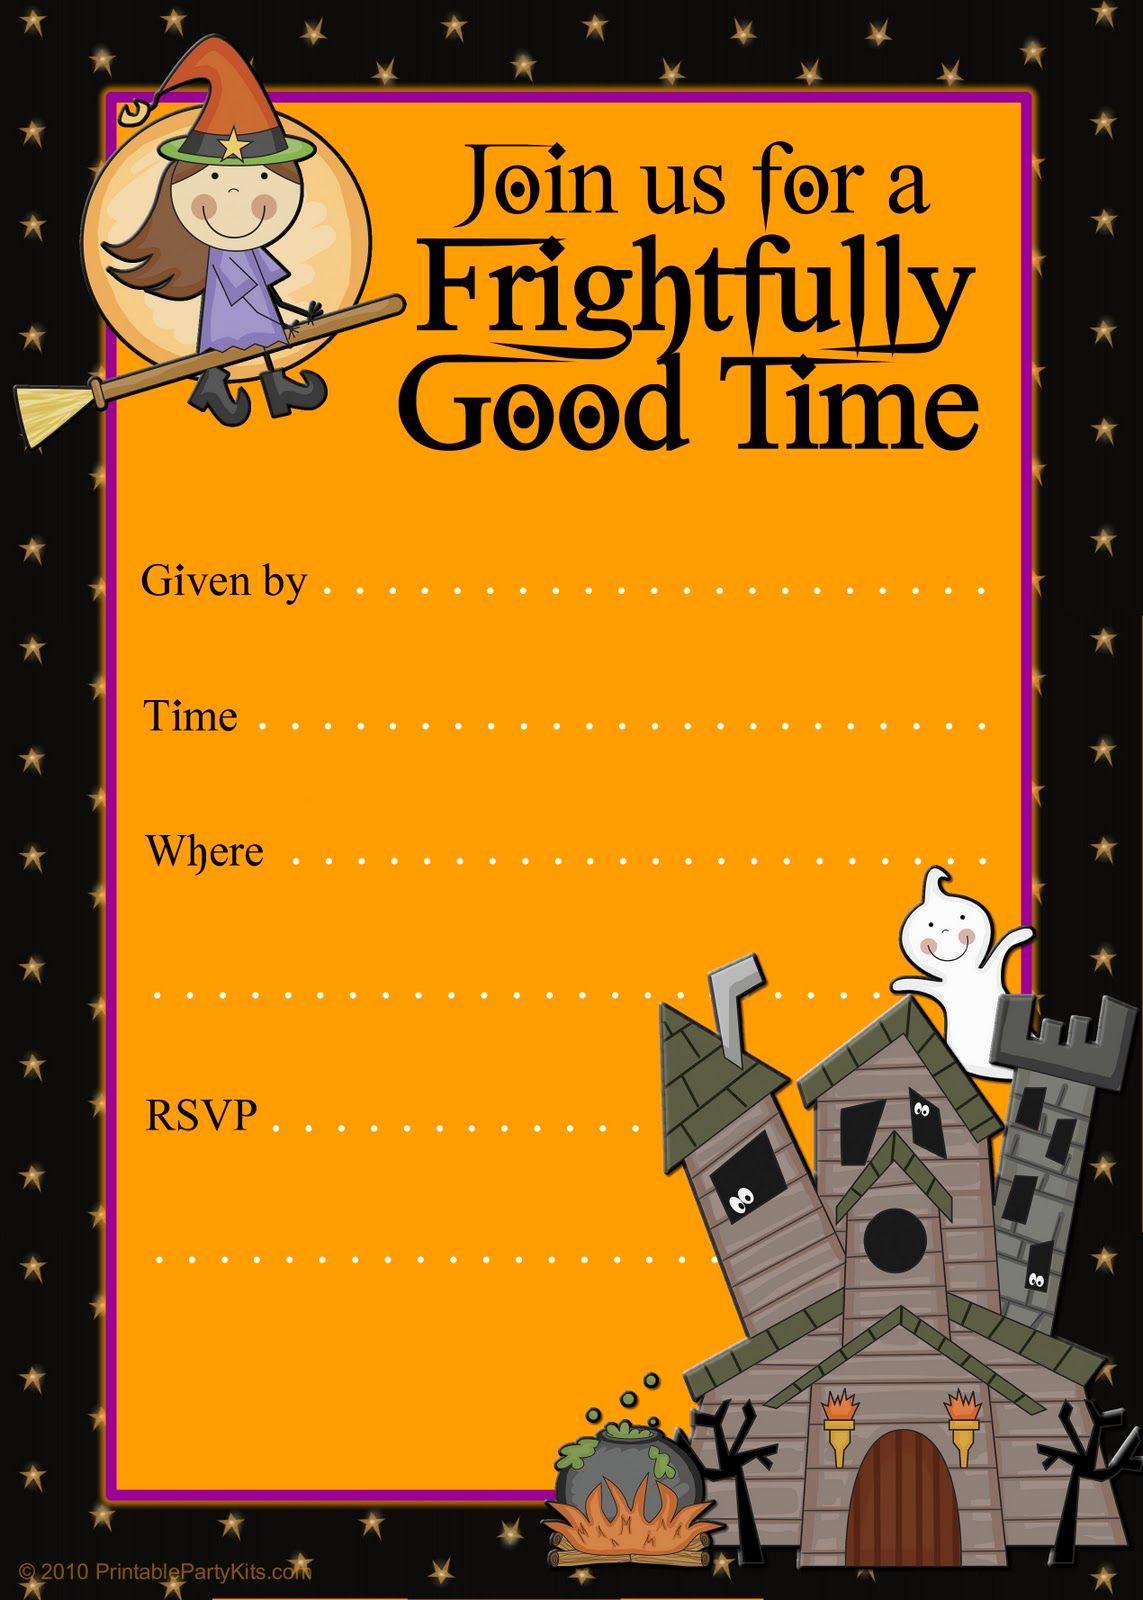 Halloween Party Invitations Templates Inspirational Free Halloween Flyer Invitations Printable